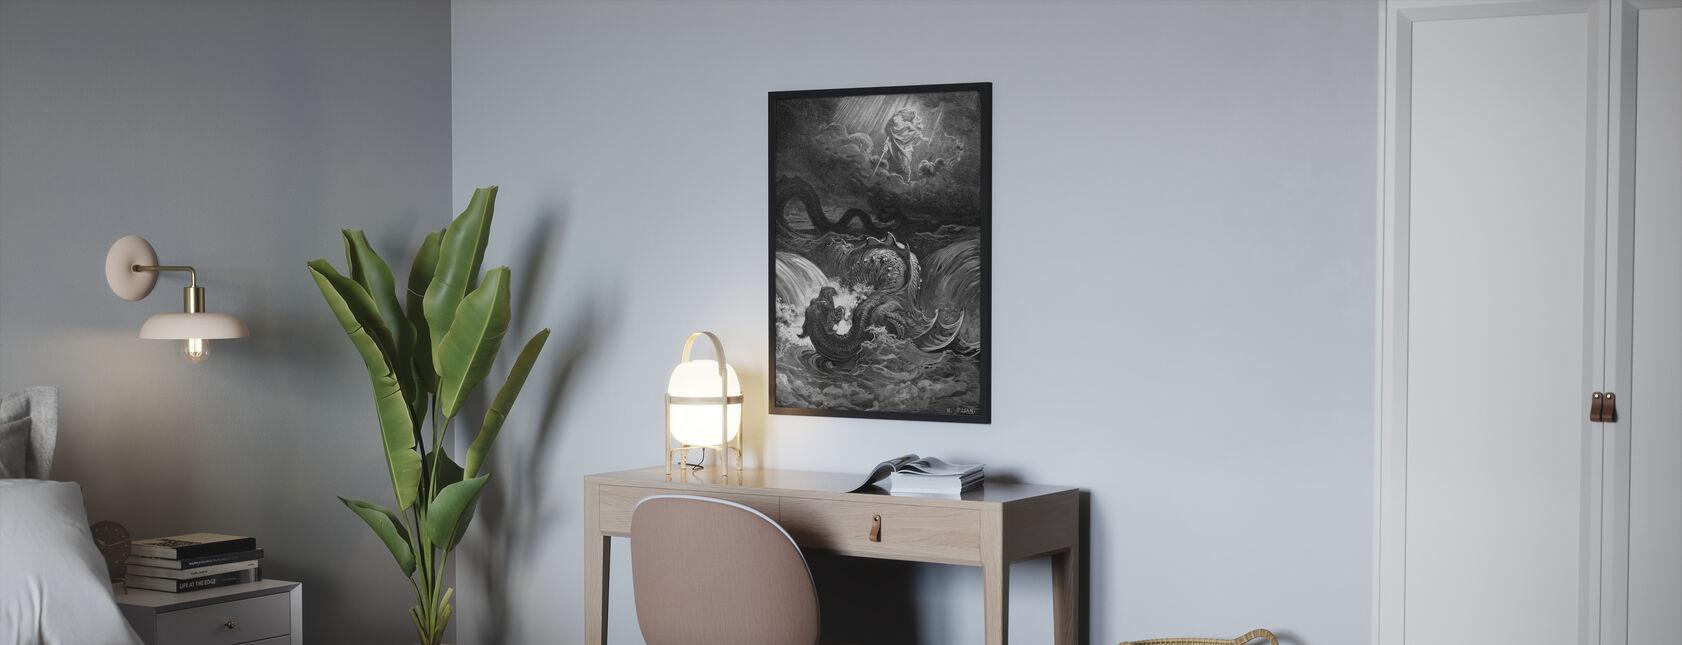 Esaias Syn - Gustave Dore - Framed print - Bedroom